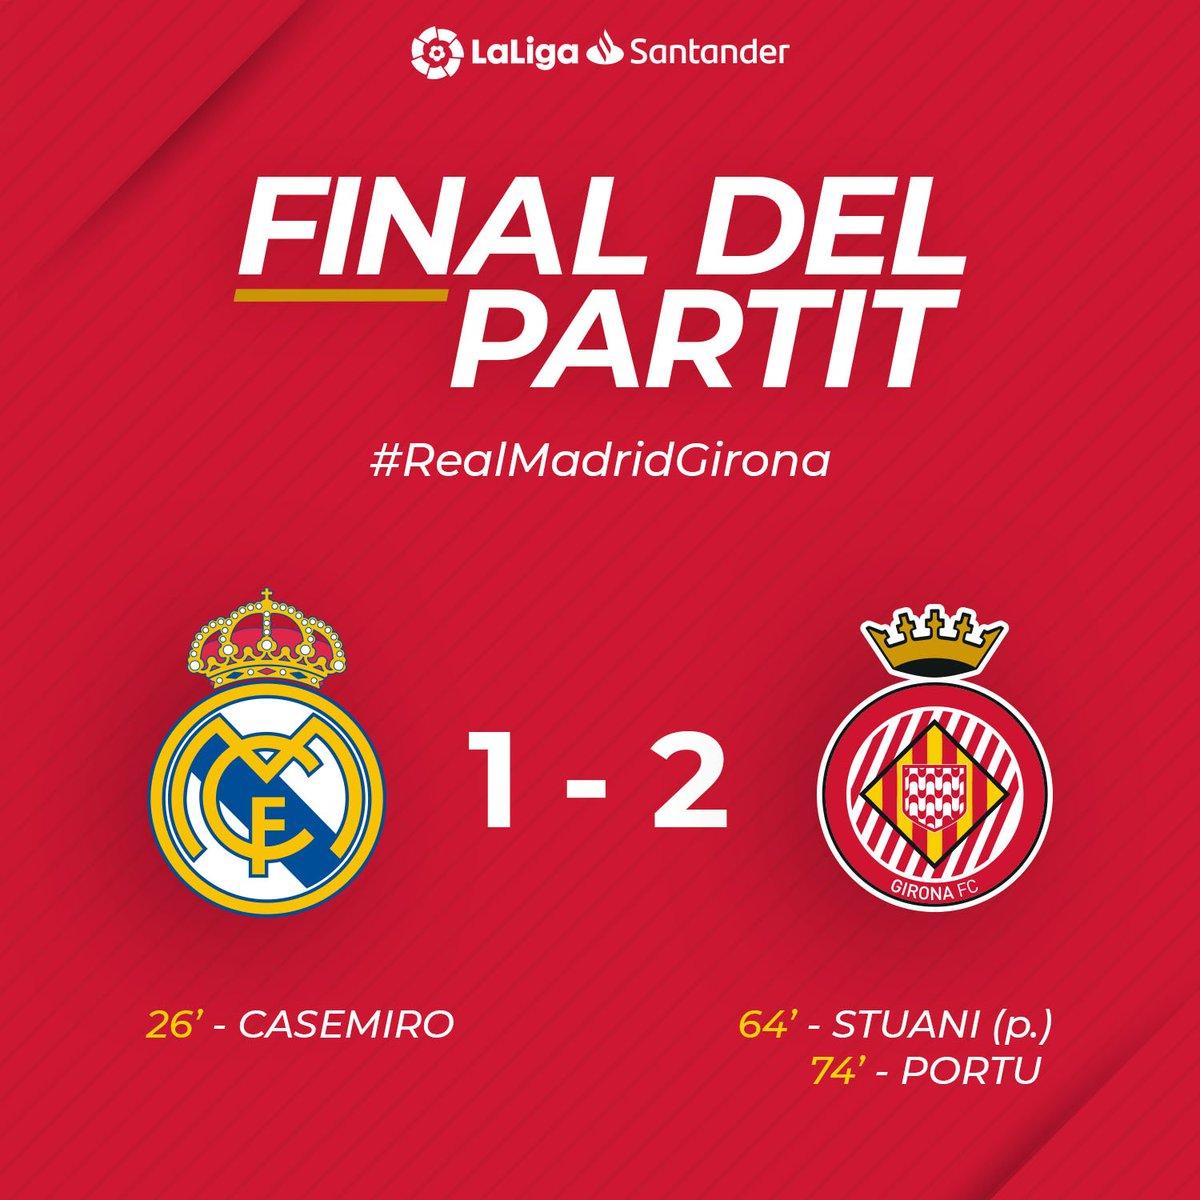 FINAL, FINAL, FINAL!!!!!  💪💪💪🔥🔥🔥  #RealMadridGirona